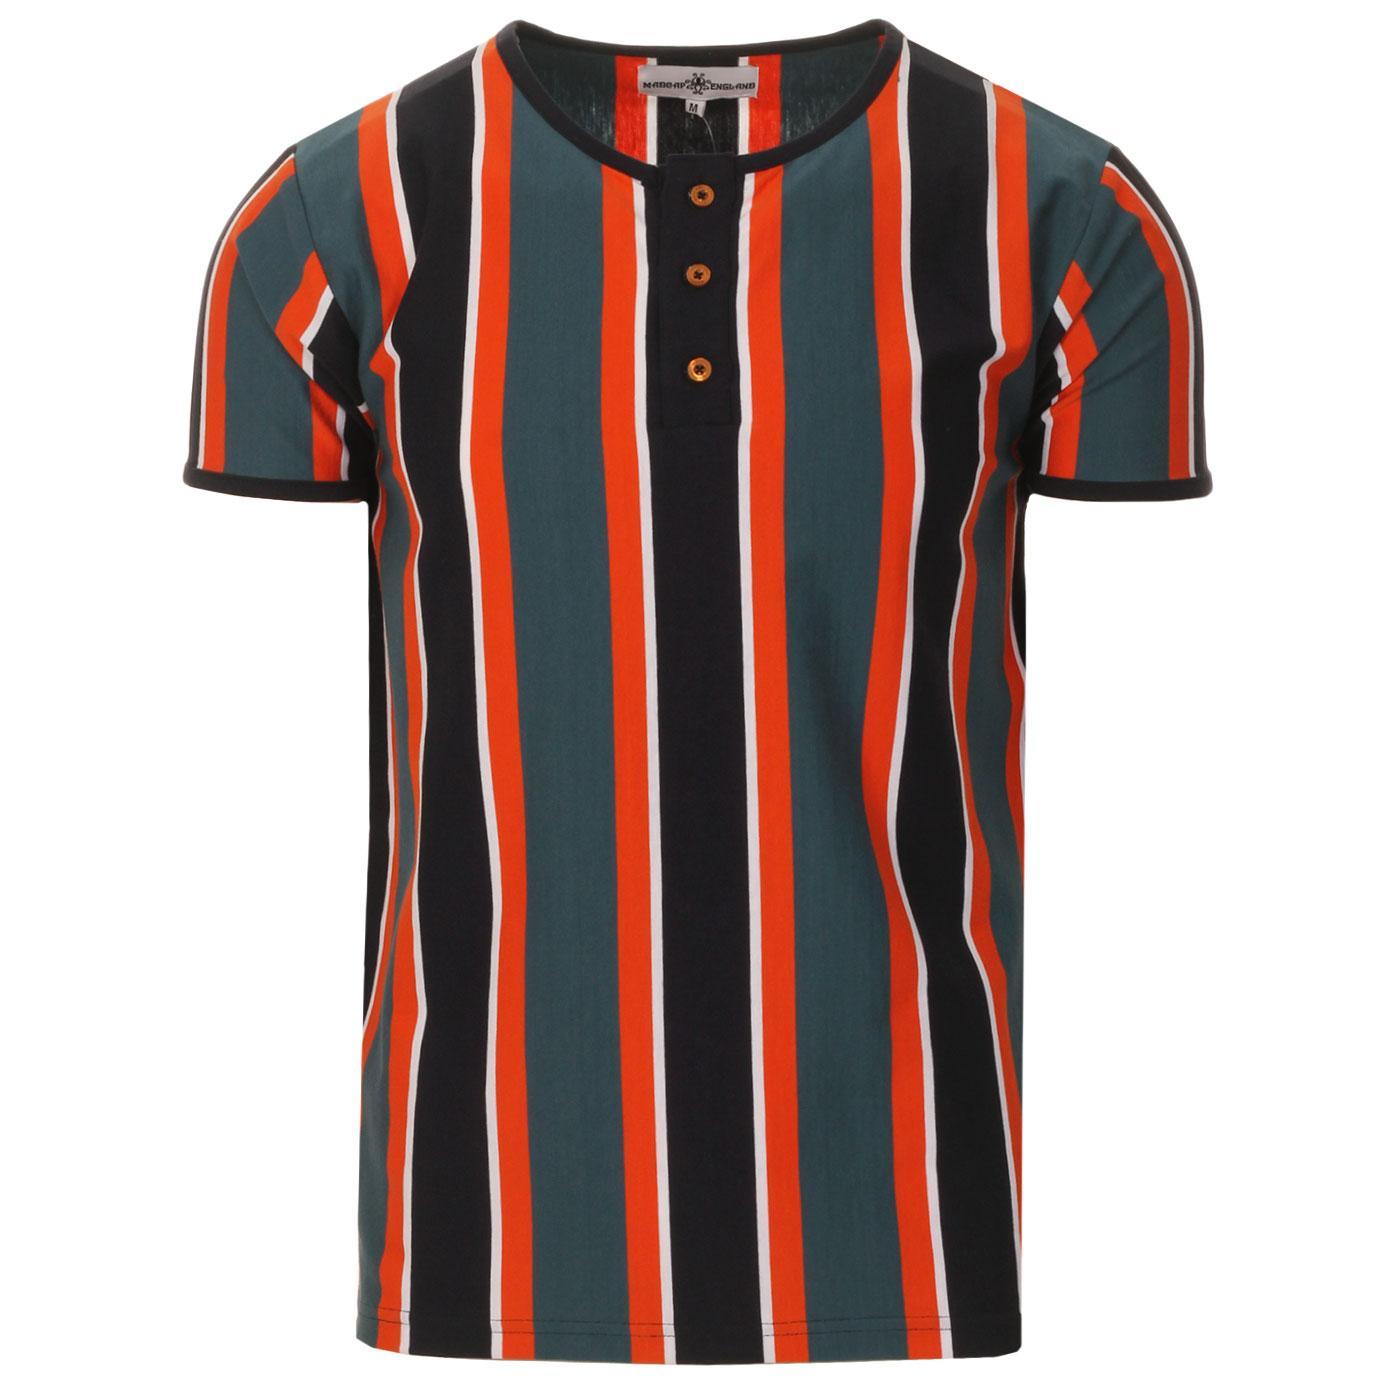 Madcap England Winstono Men's Retro 60s Stripe Grandad T-shirt in Tapestry